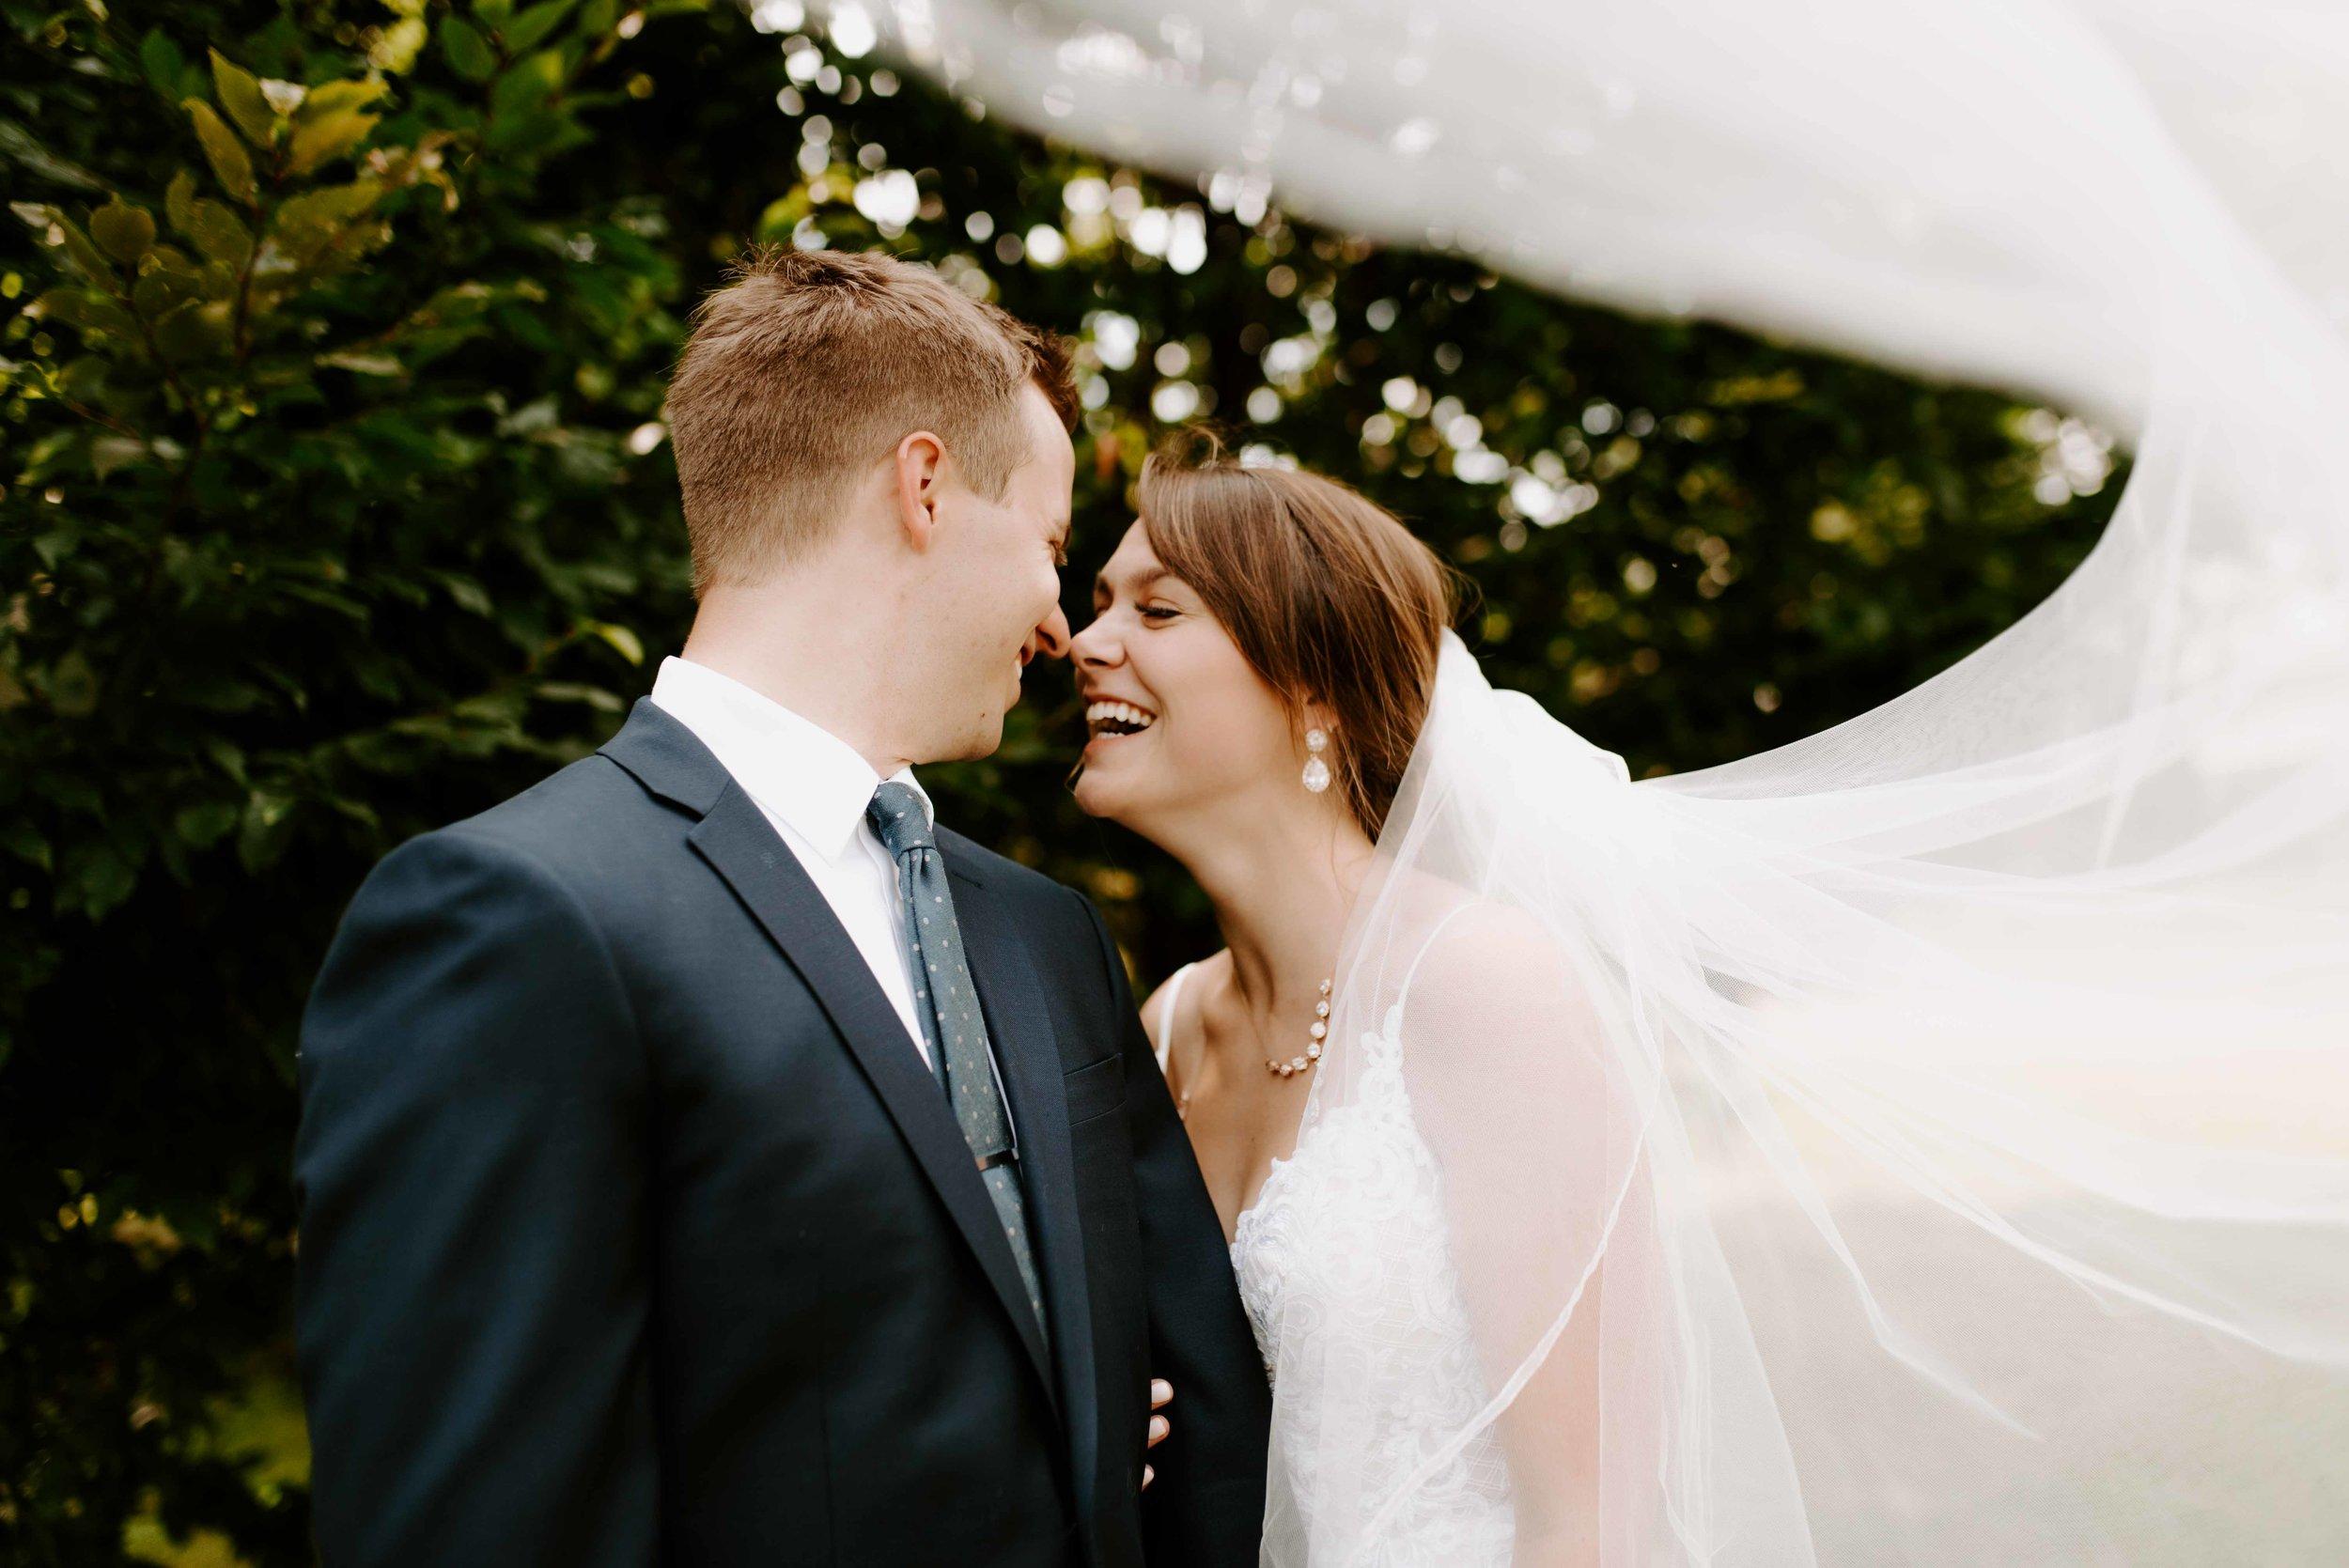 Chicago Wedding Photographer Garfield Park Conservatory-1-5.jpg